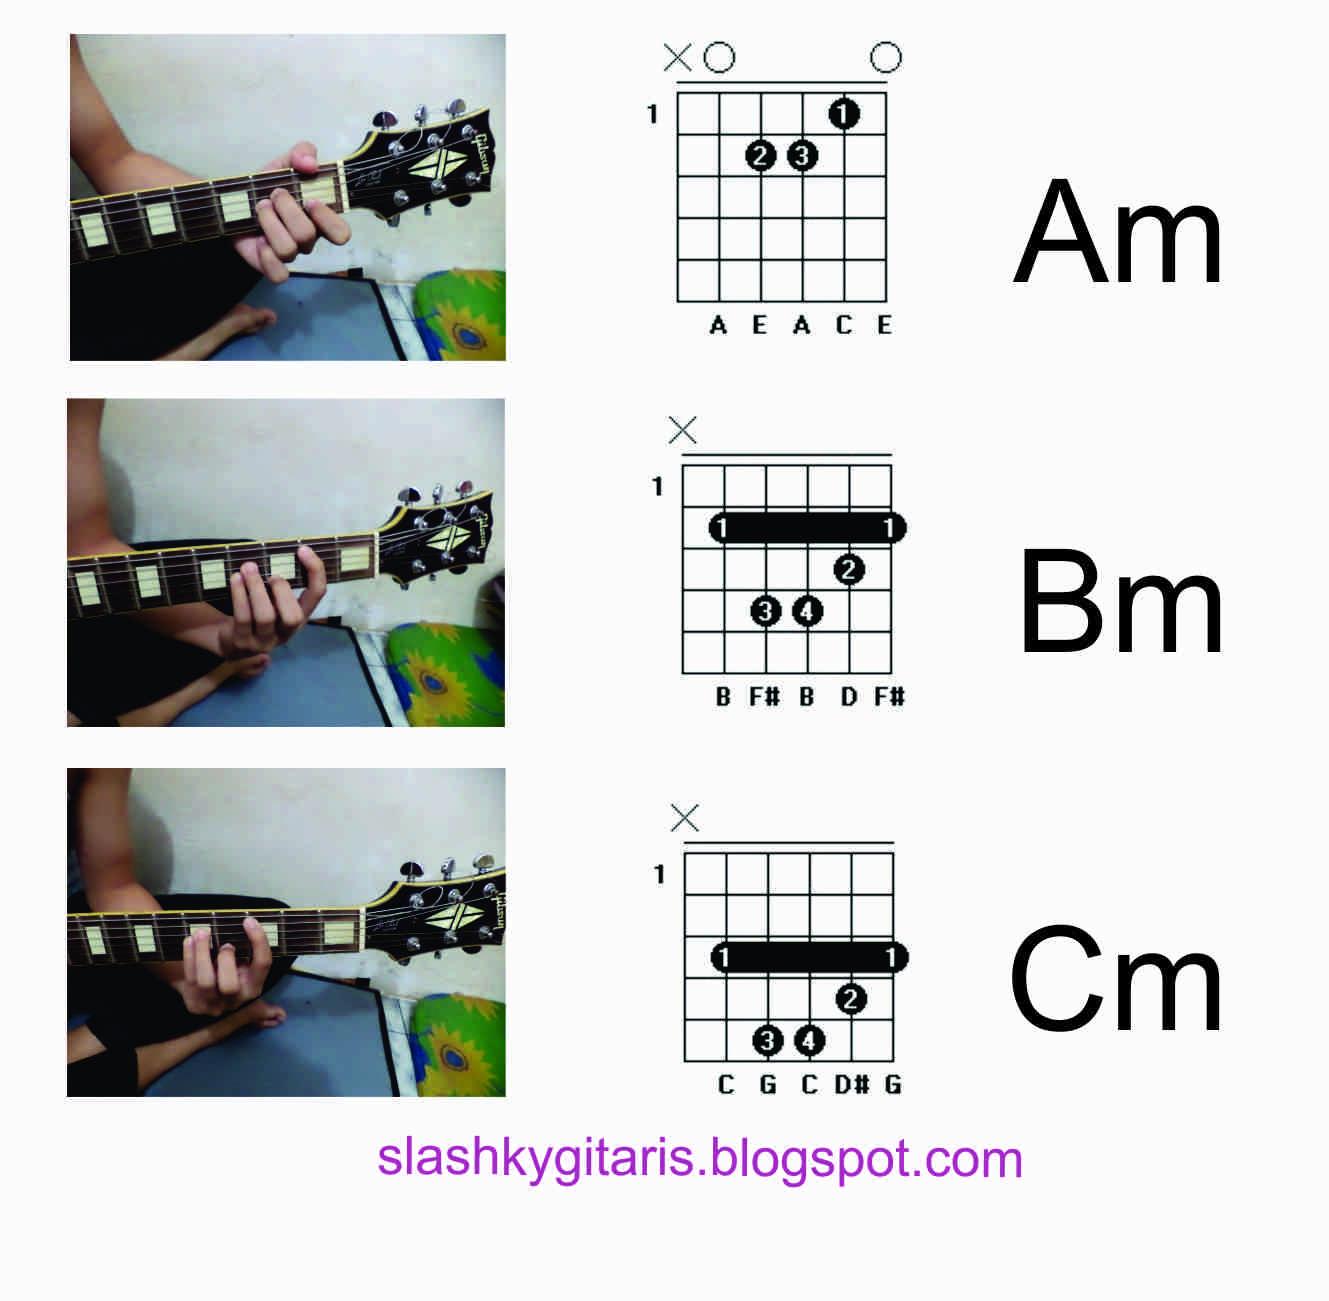 Cord Gitar Dasar: Kurnia: Cara Belajar Gitar + Gambar Chord Untuk Pemula